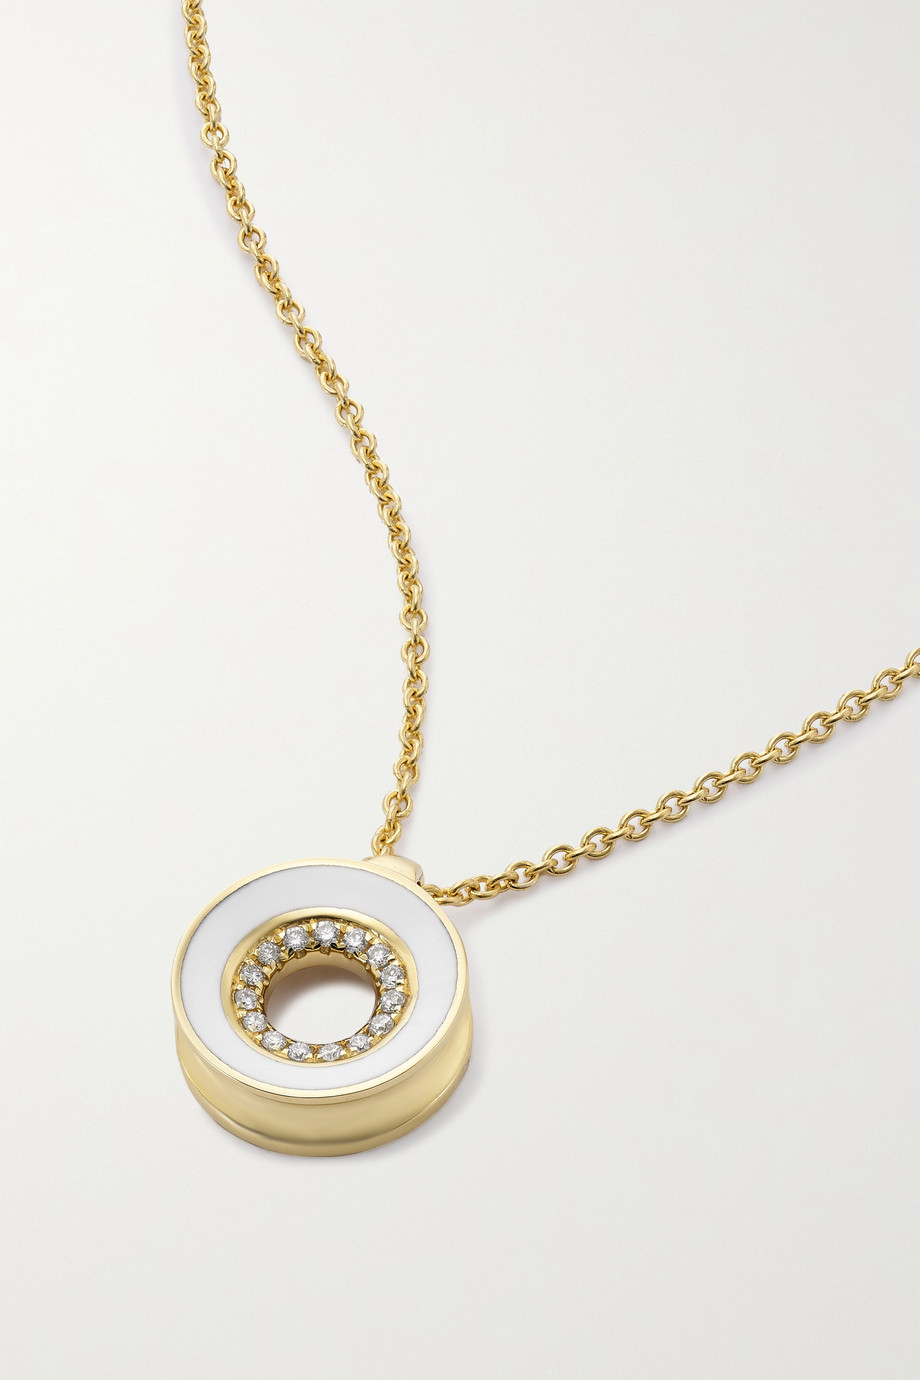 State Property Rinzo 18-karat gold, enamel and diamond necklace